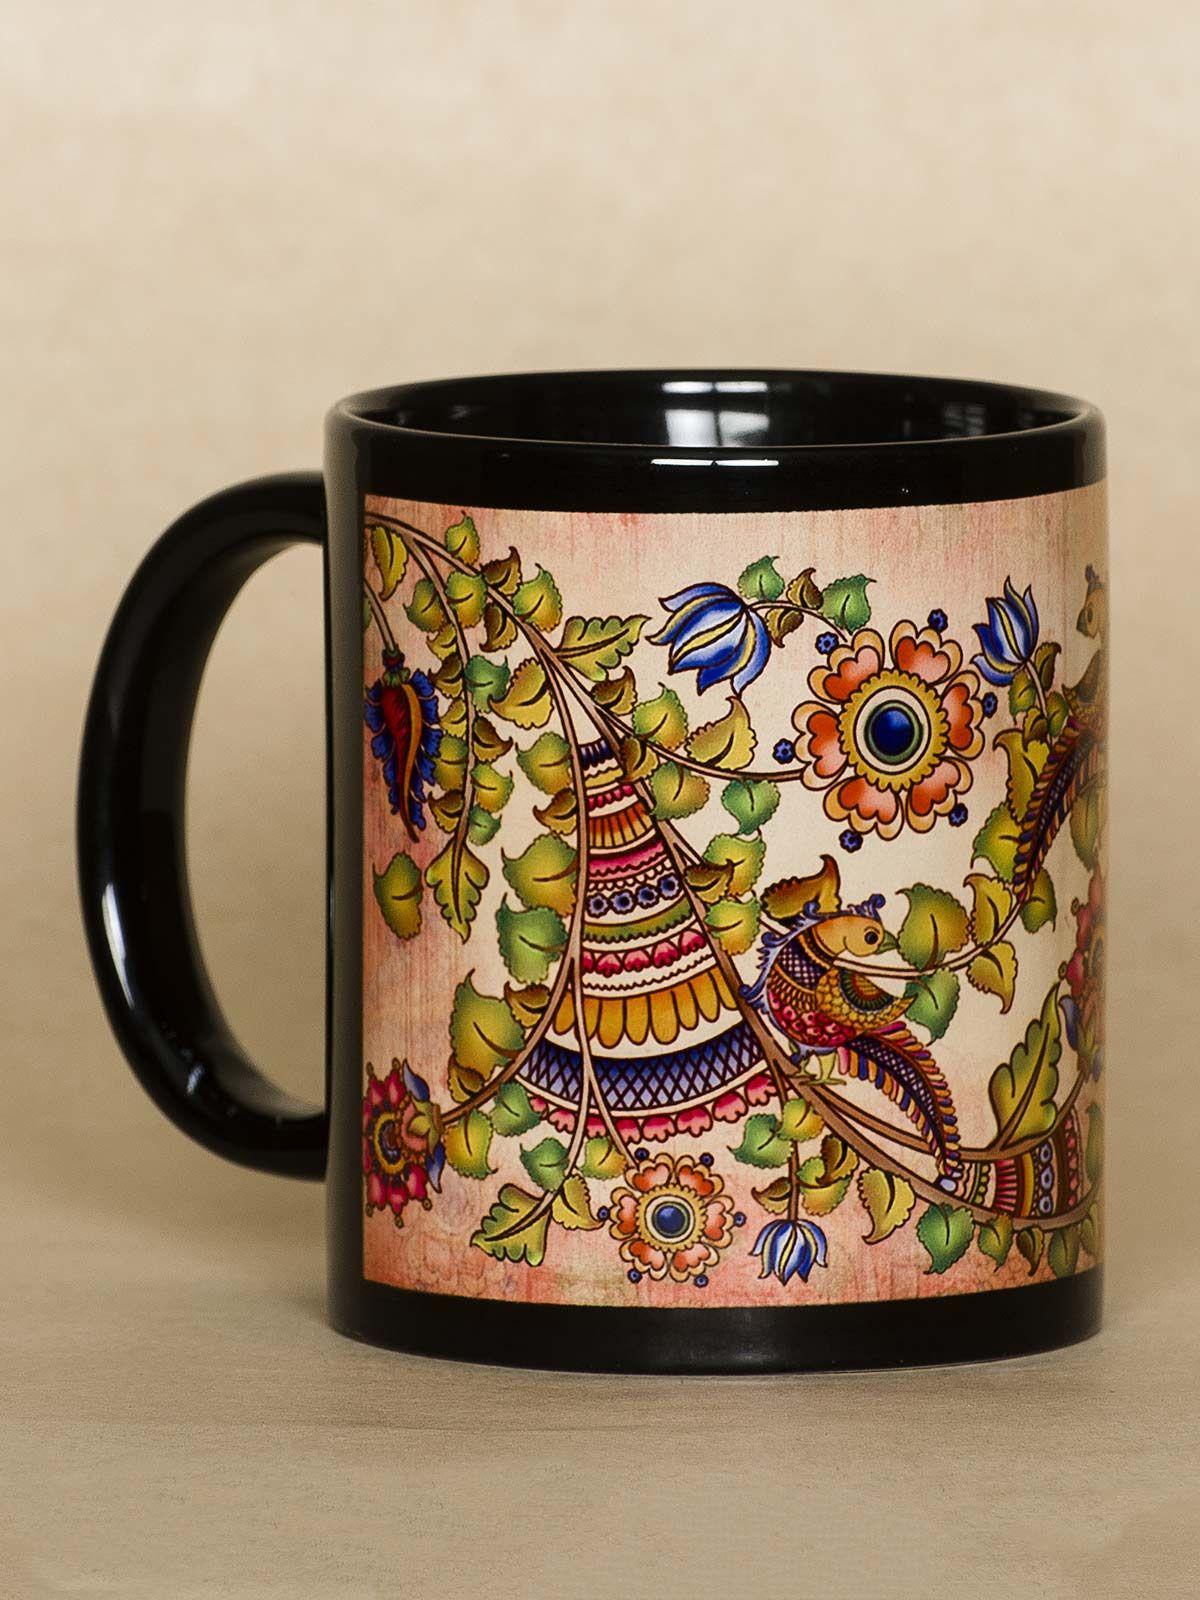 Gold Peacock mug